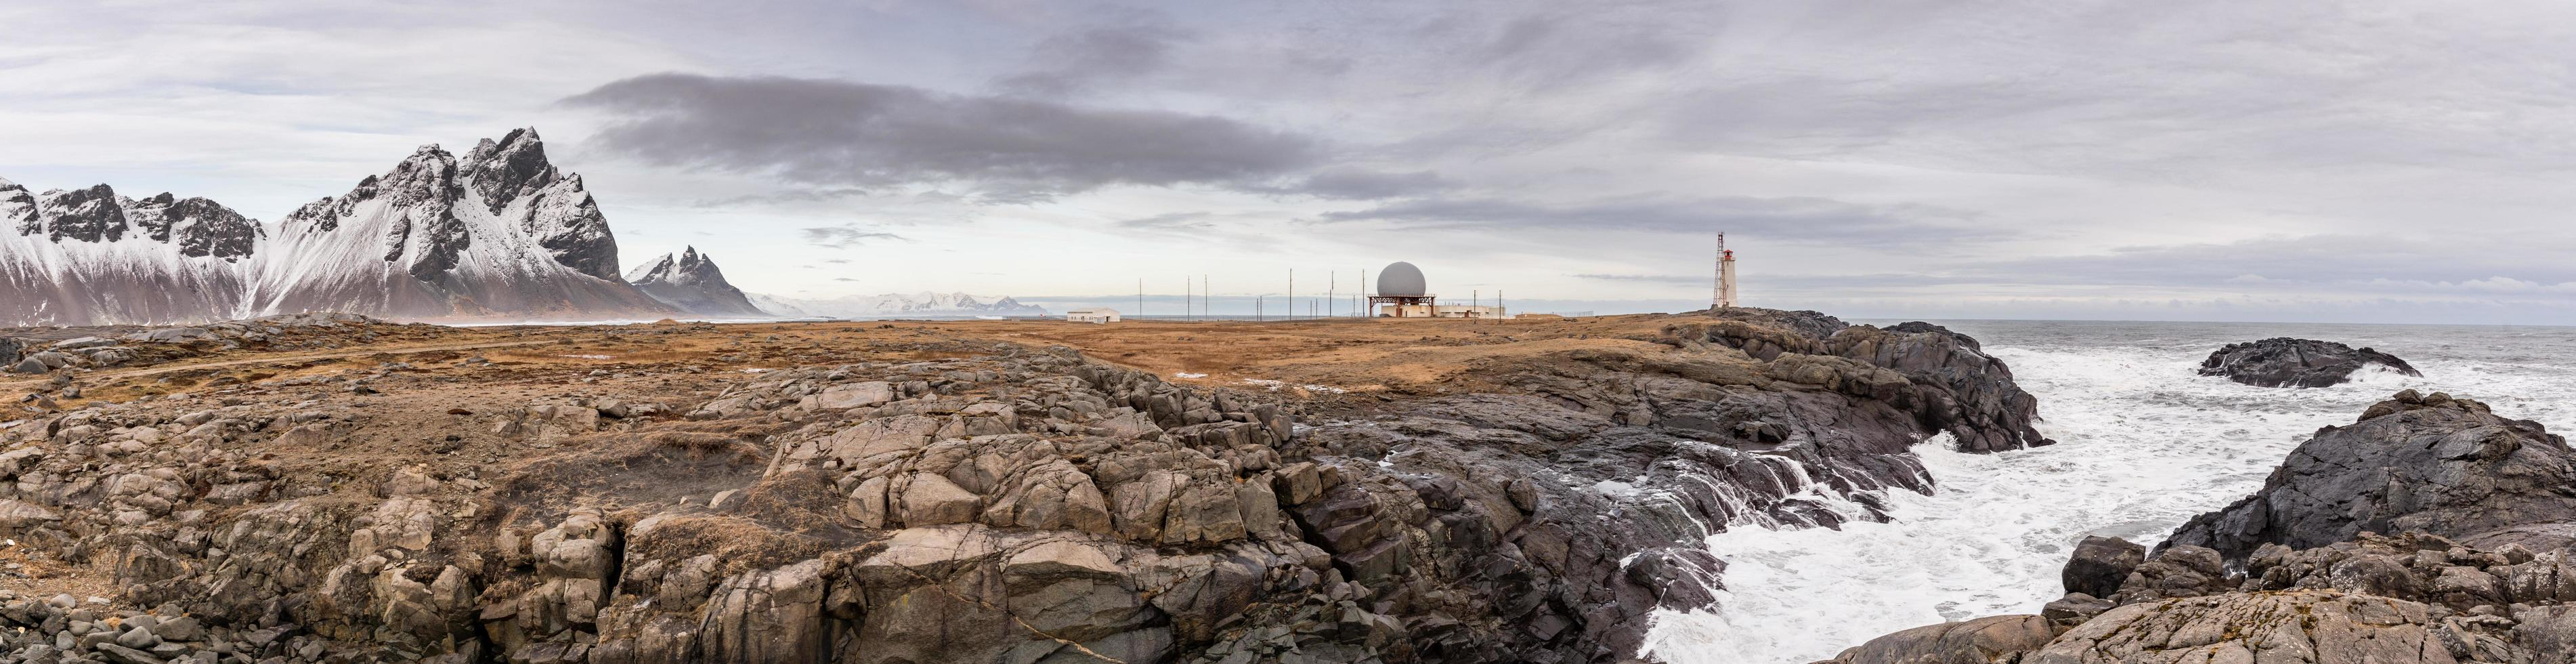 Panorama de Stokksnes dans le parc national de Vatnajokull en Islande photo